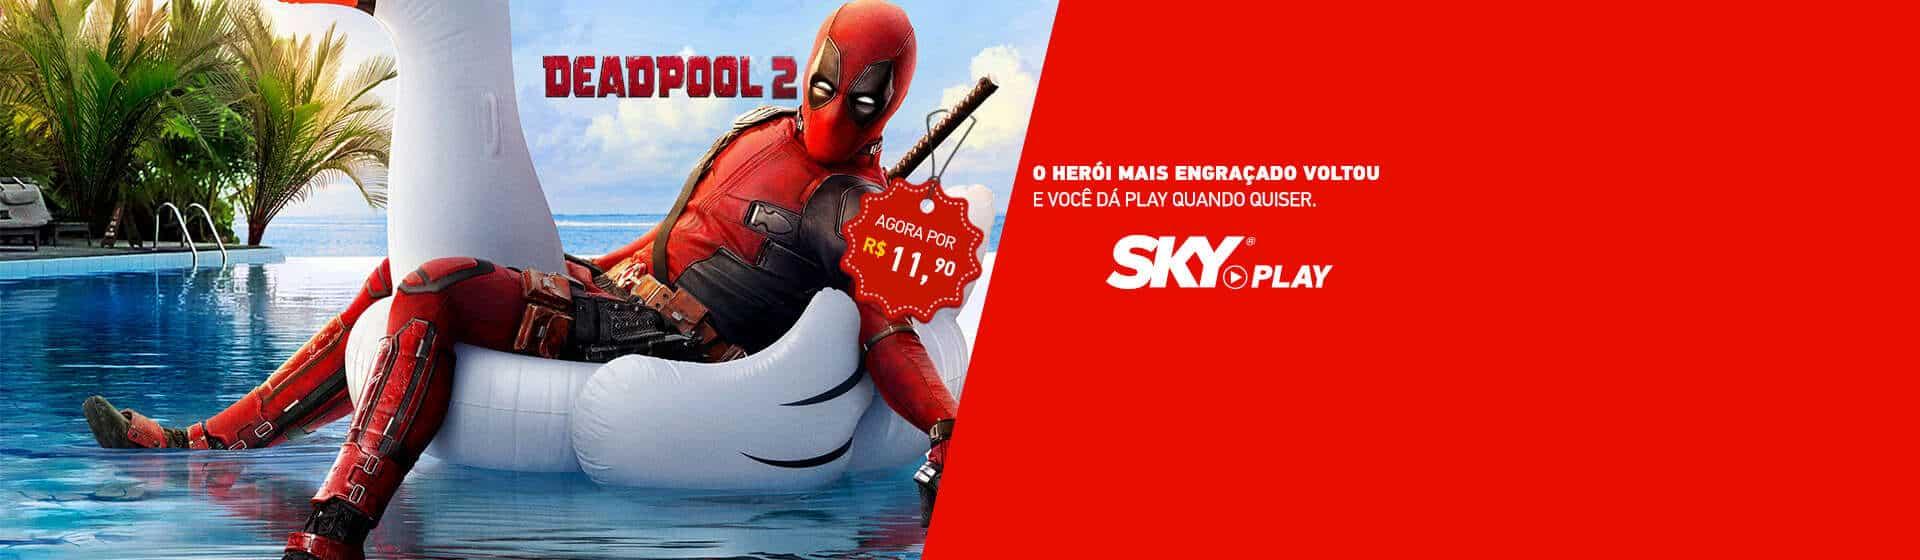 Sky Play - SKY TV